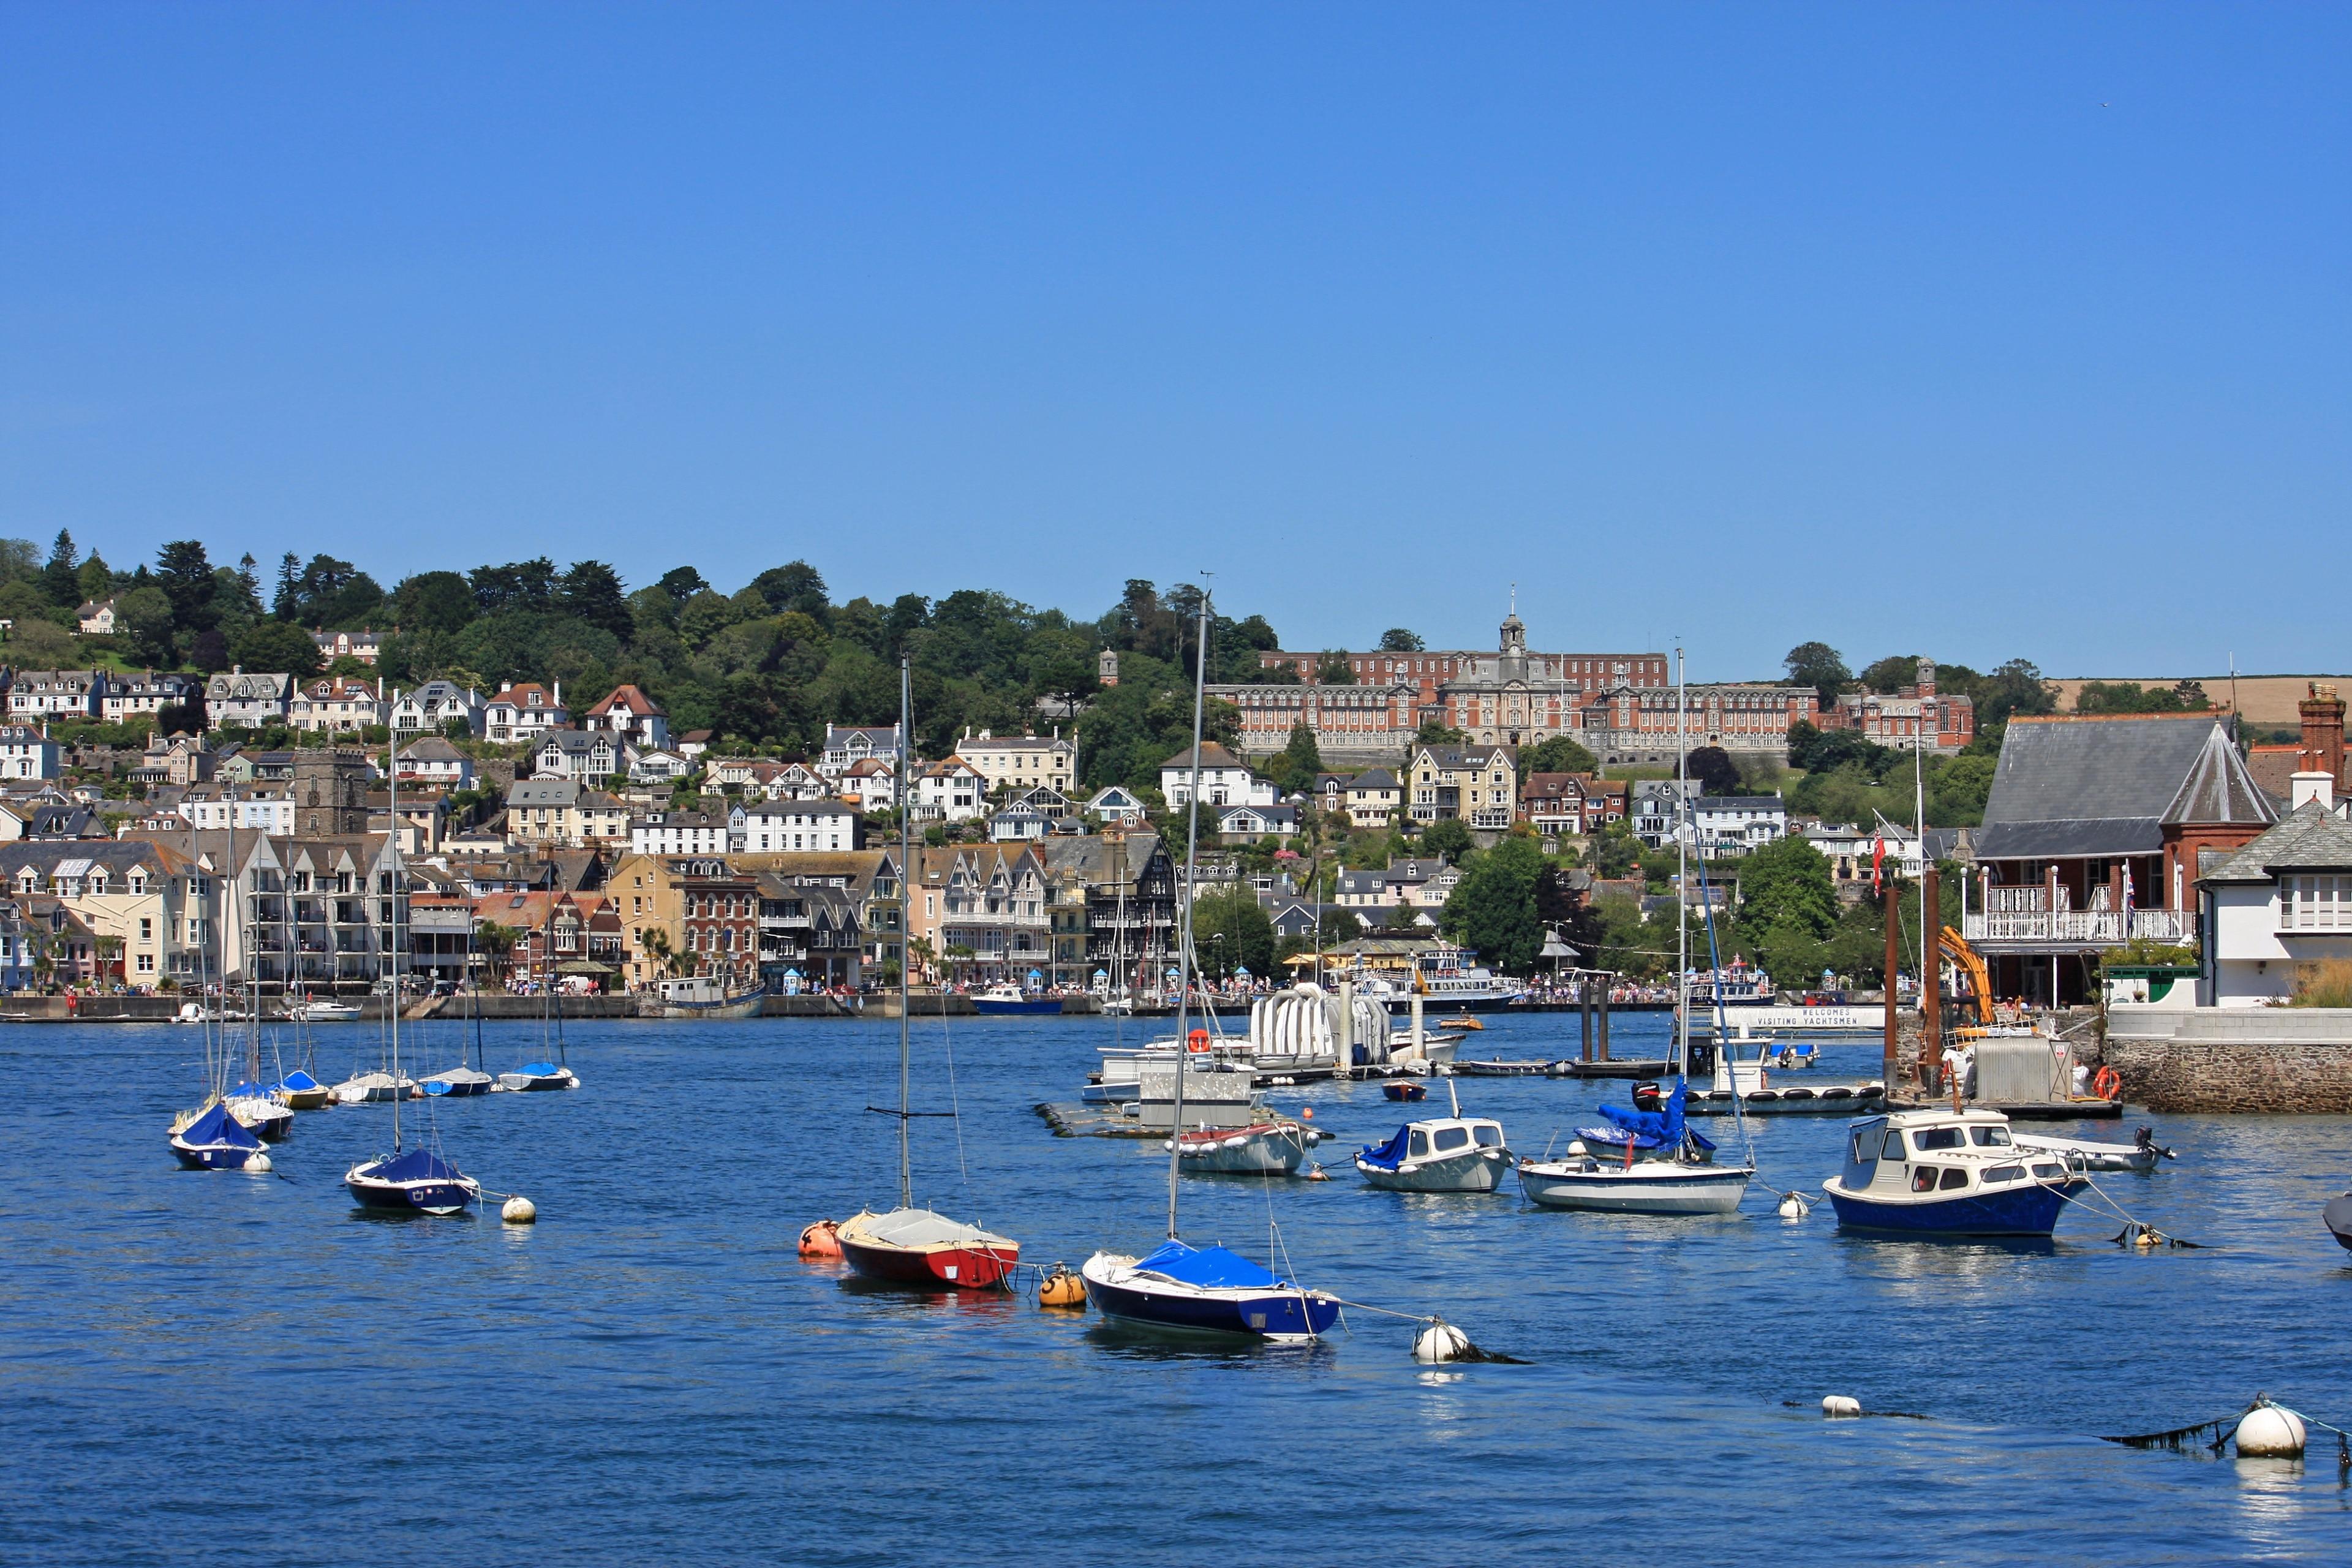 Dartmouth, England, United Kingdom